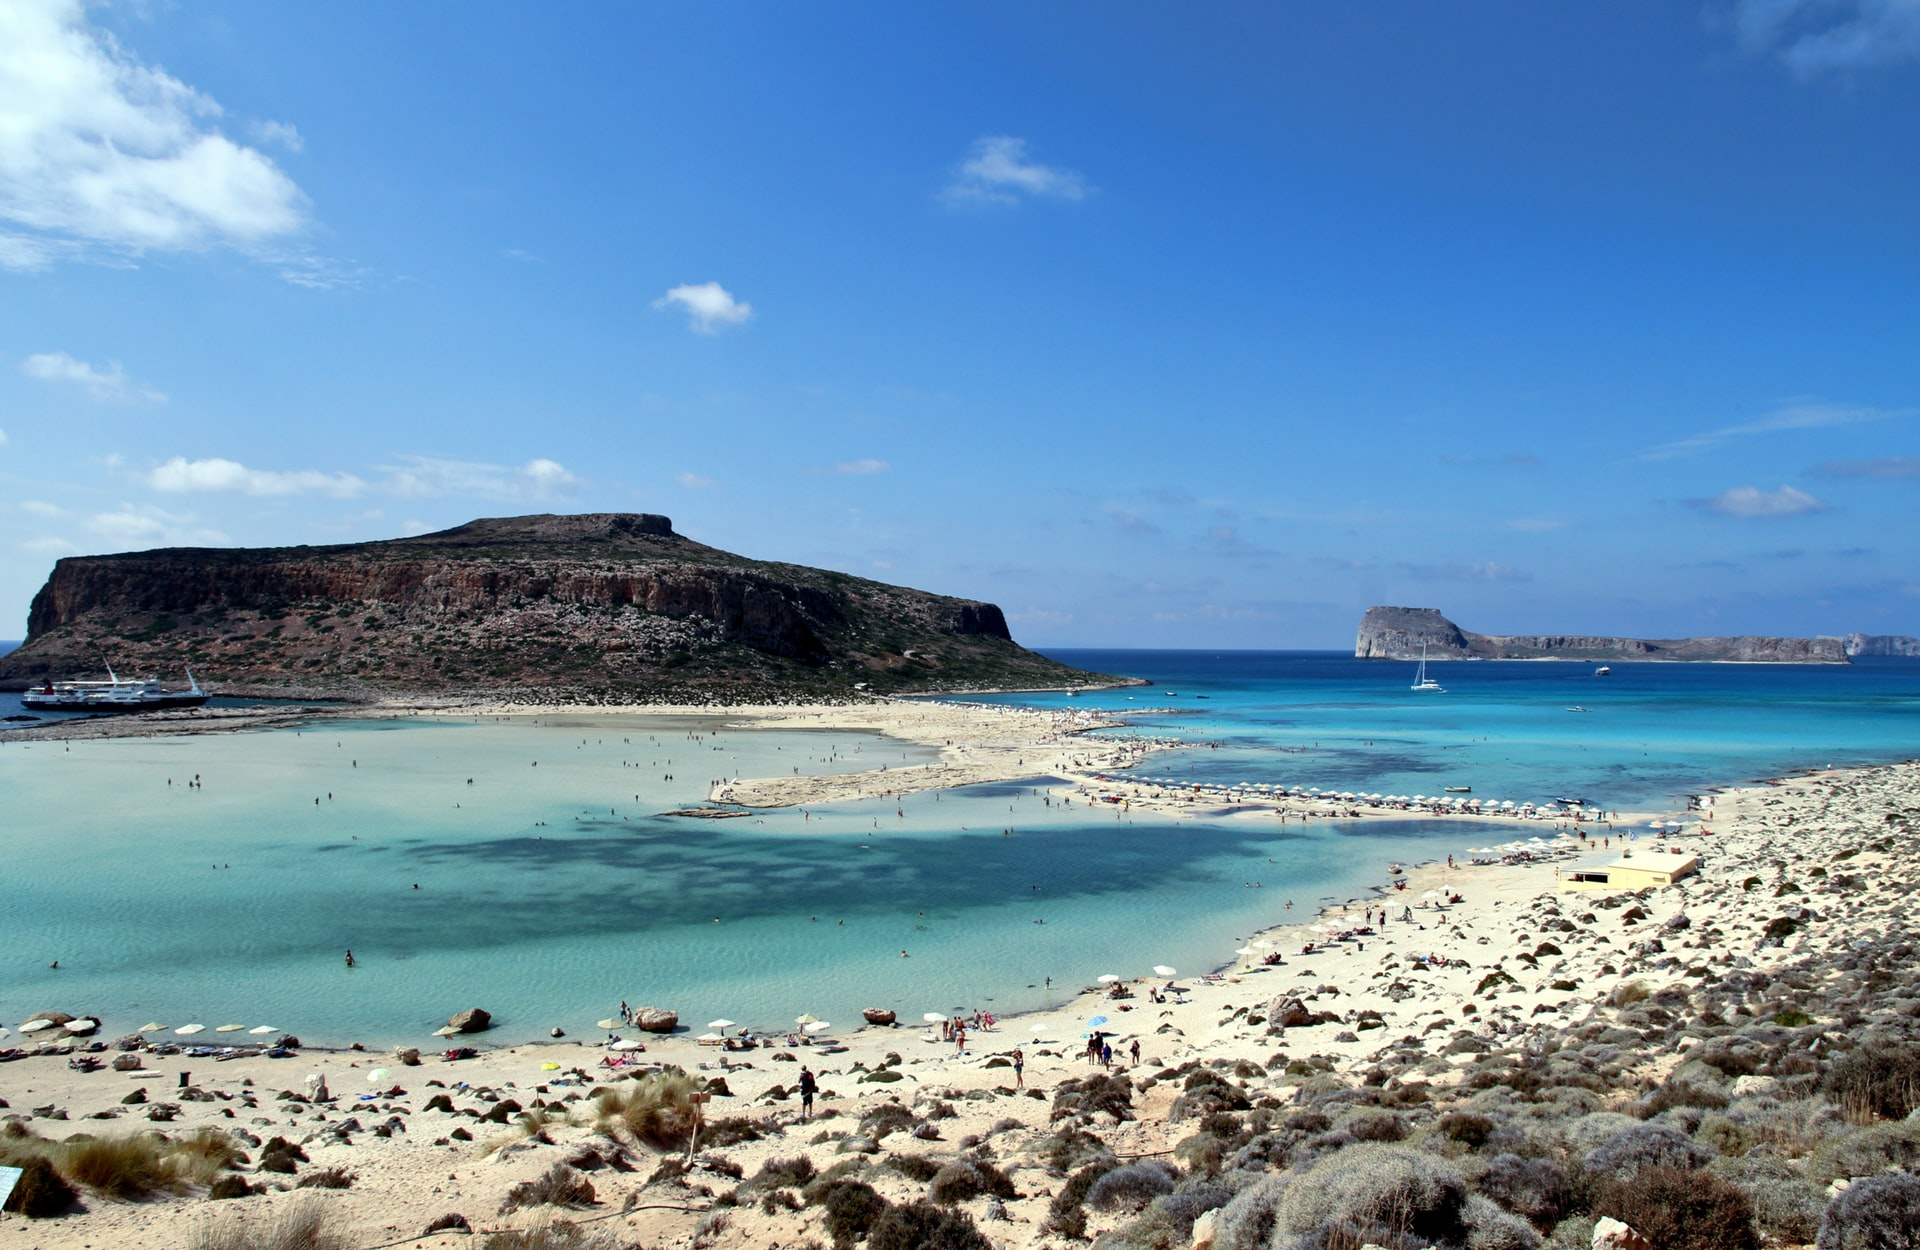 kissamos beach plage grèce cyclades lagon